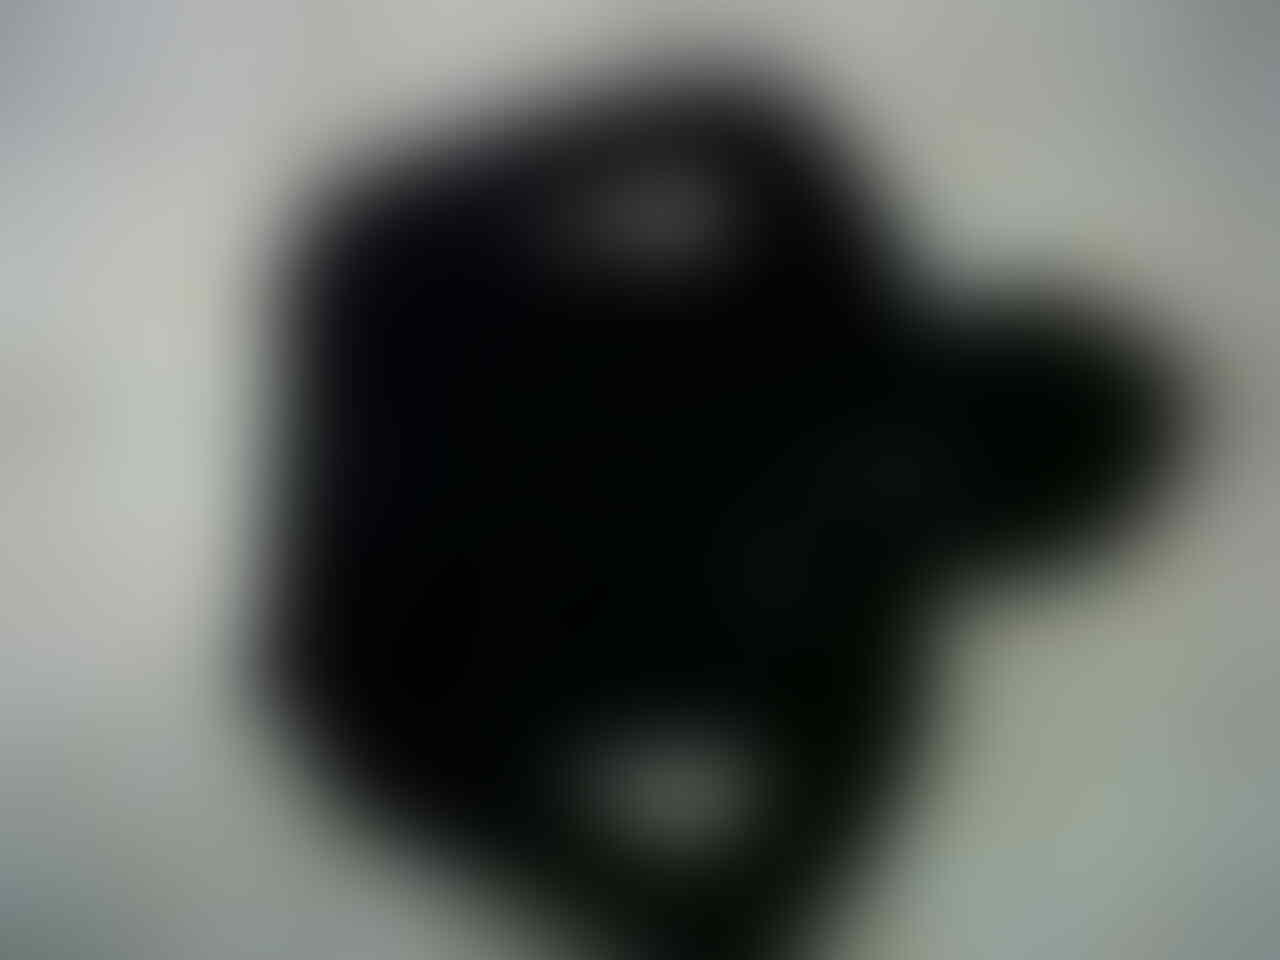 Kaos,kemeja,hoodie,celana,l090,the dexter,gravell,petersaysdenim(psd)